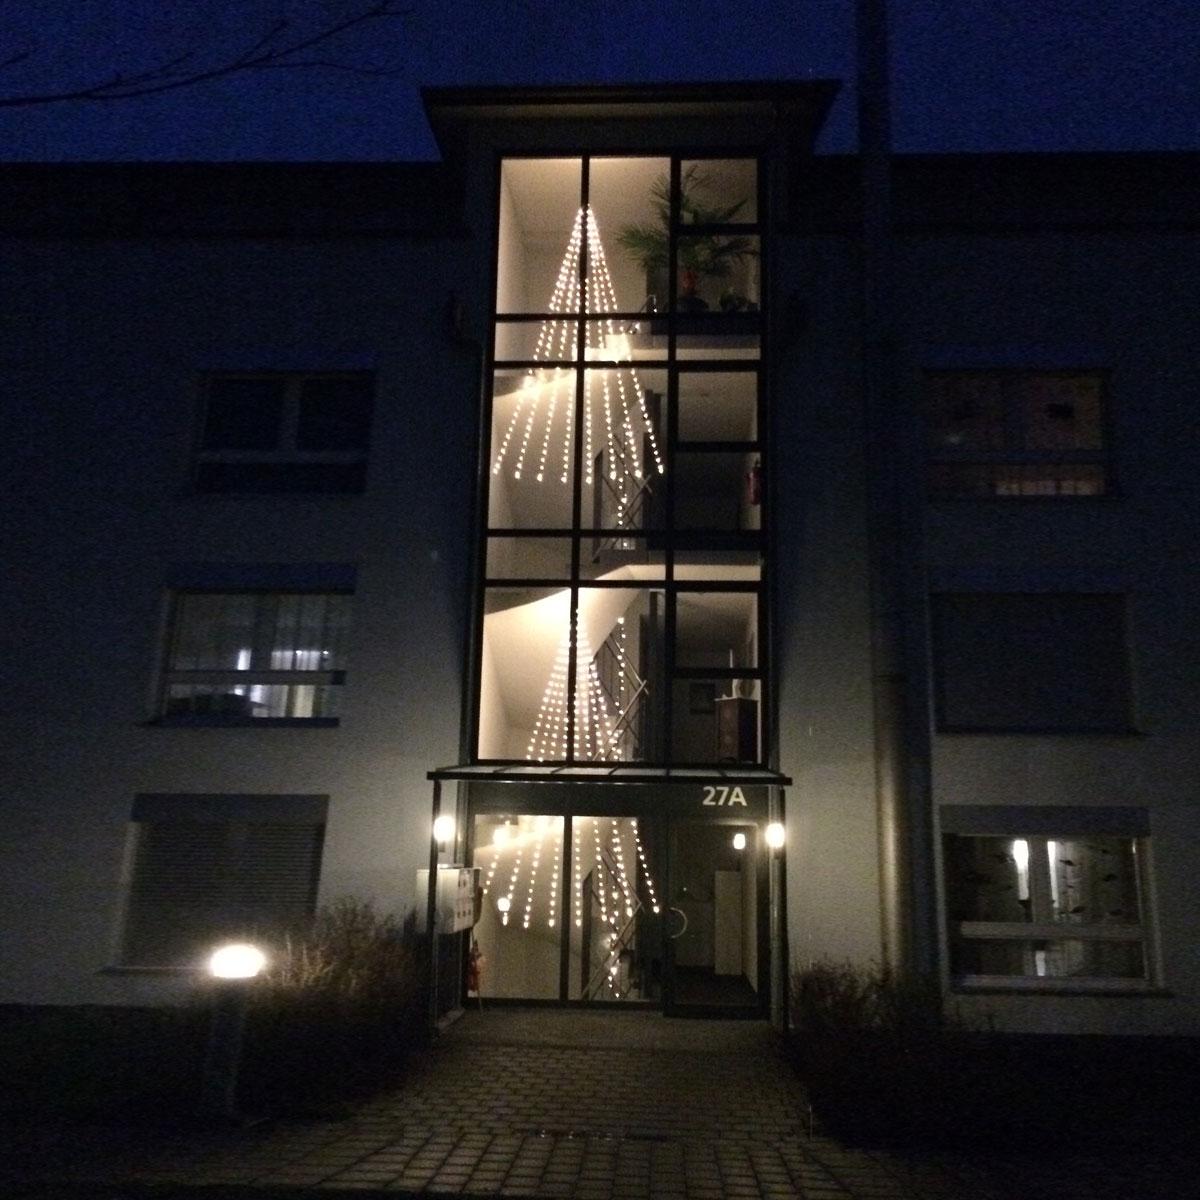 Mehrfamilienhaus mit Treppenhaus mit Engelshaaren